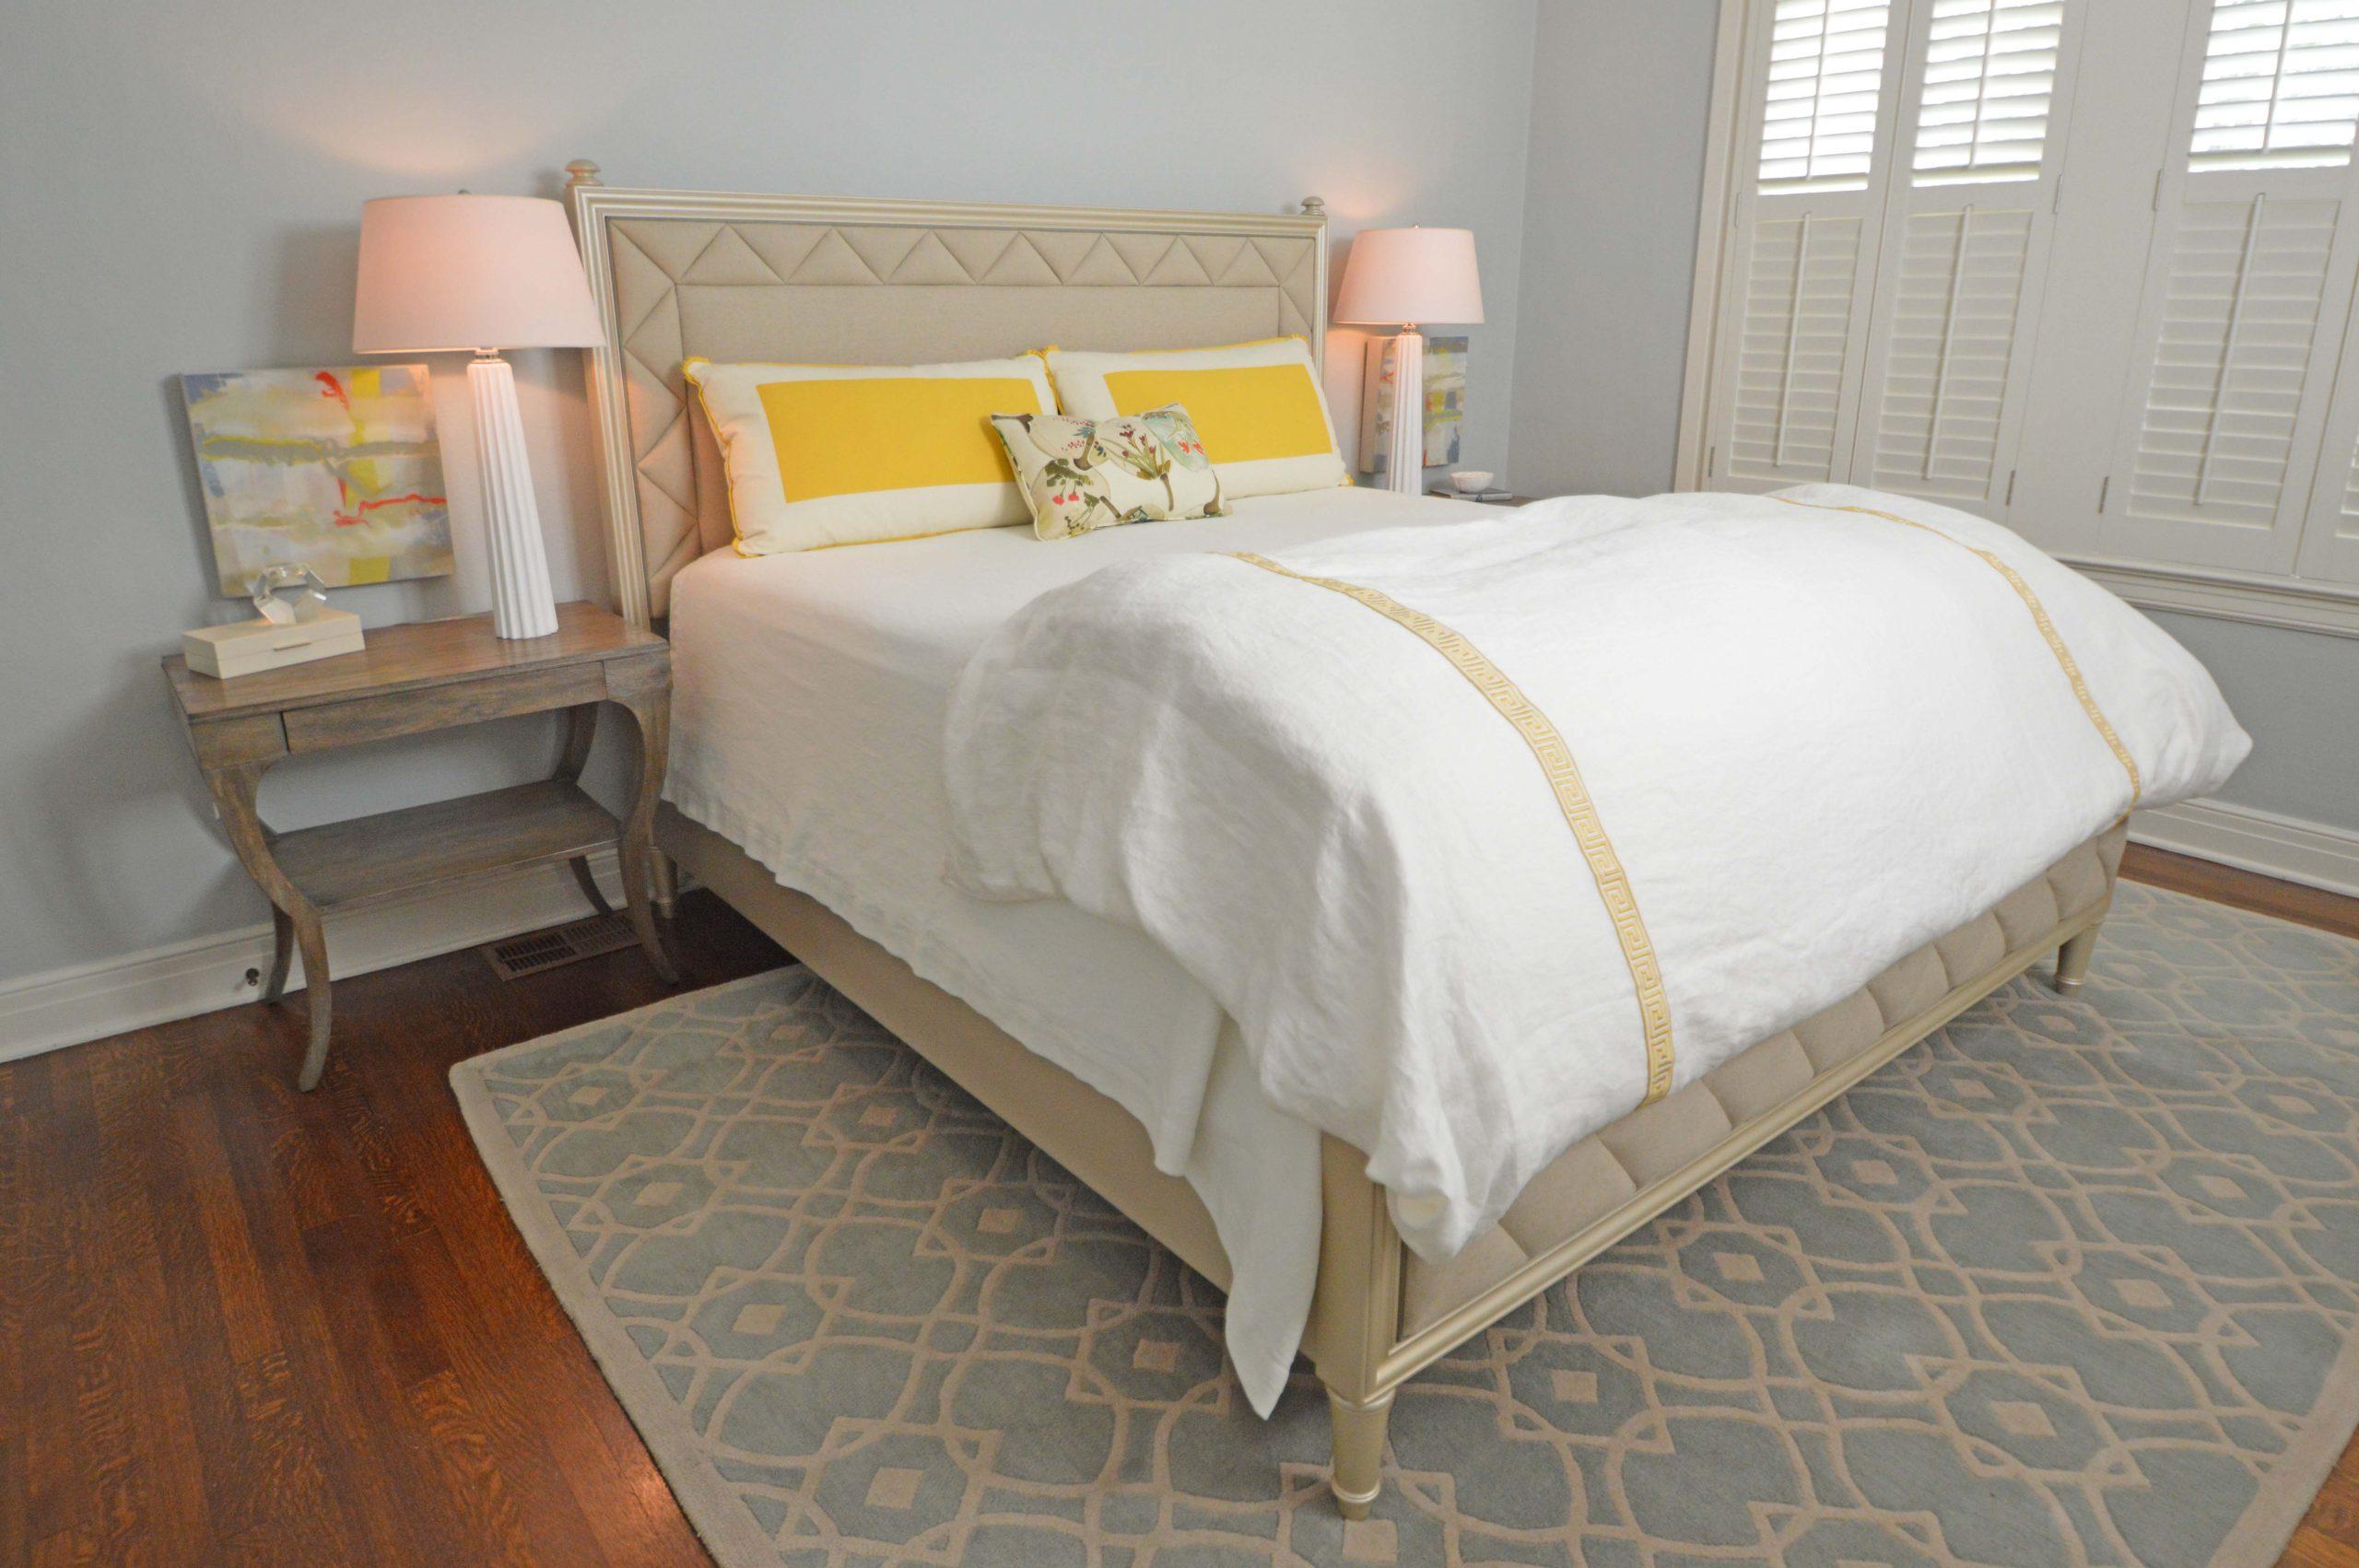 maranto-david-dixon-smith-interiors-baton-rouge-interior-design-custom-furniture-web-0003